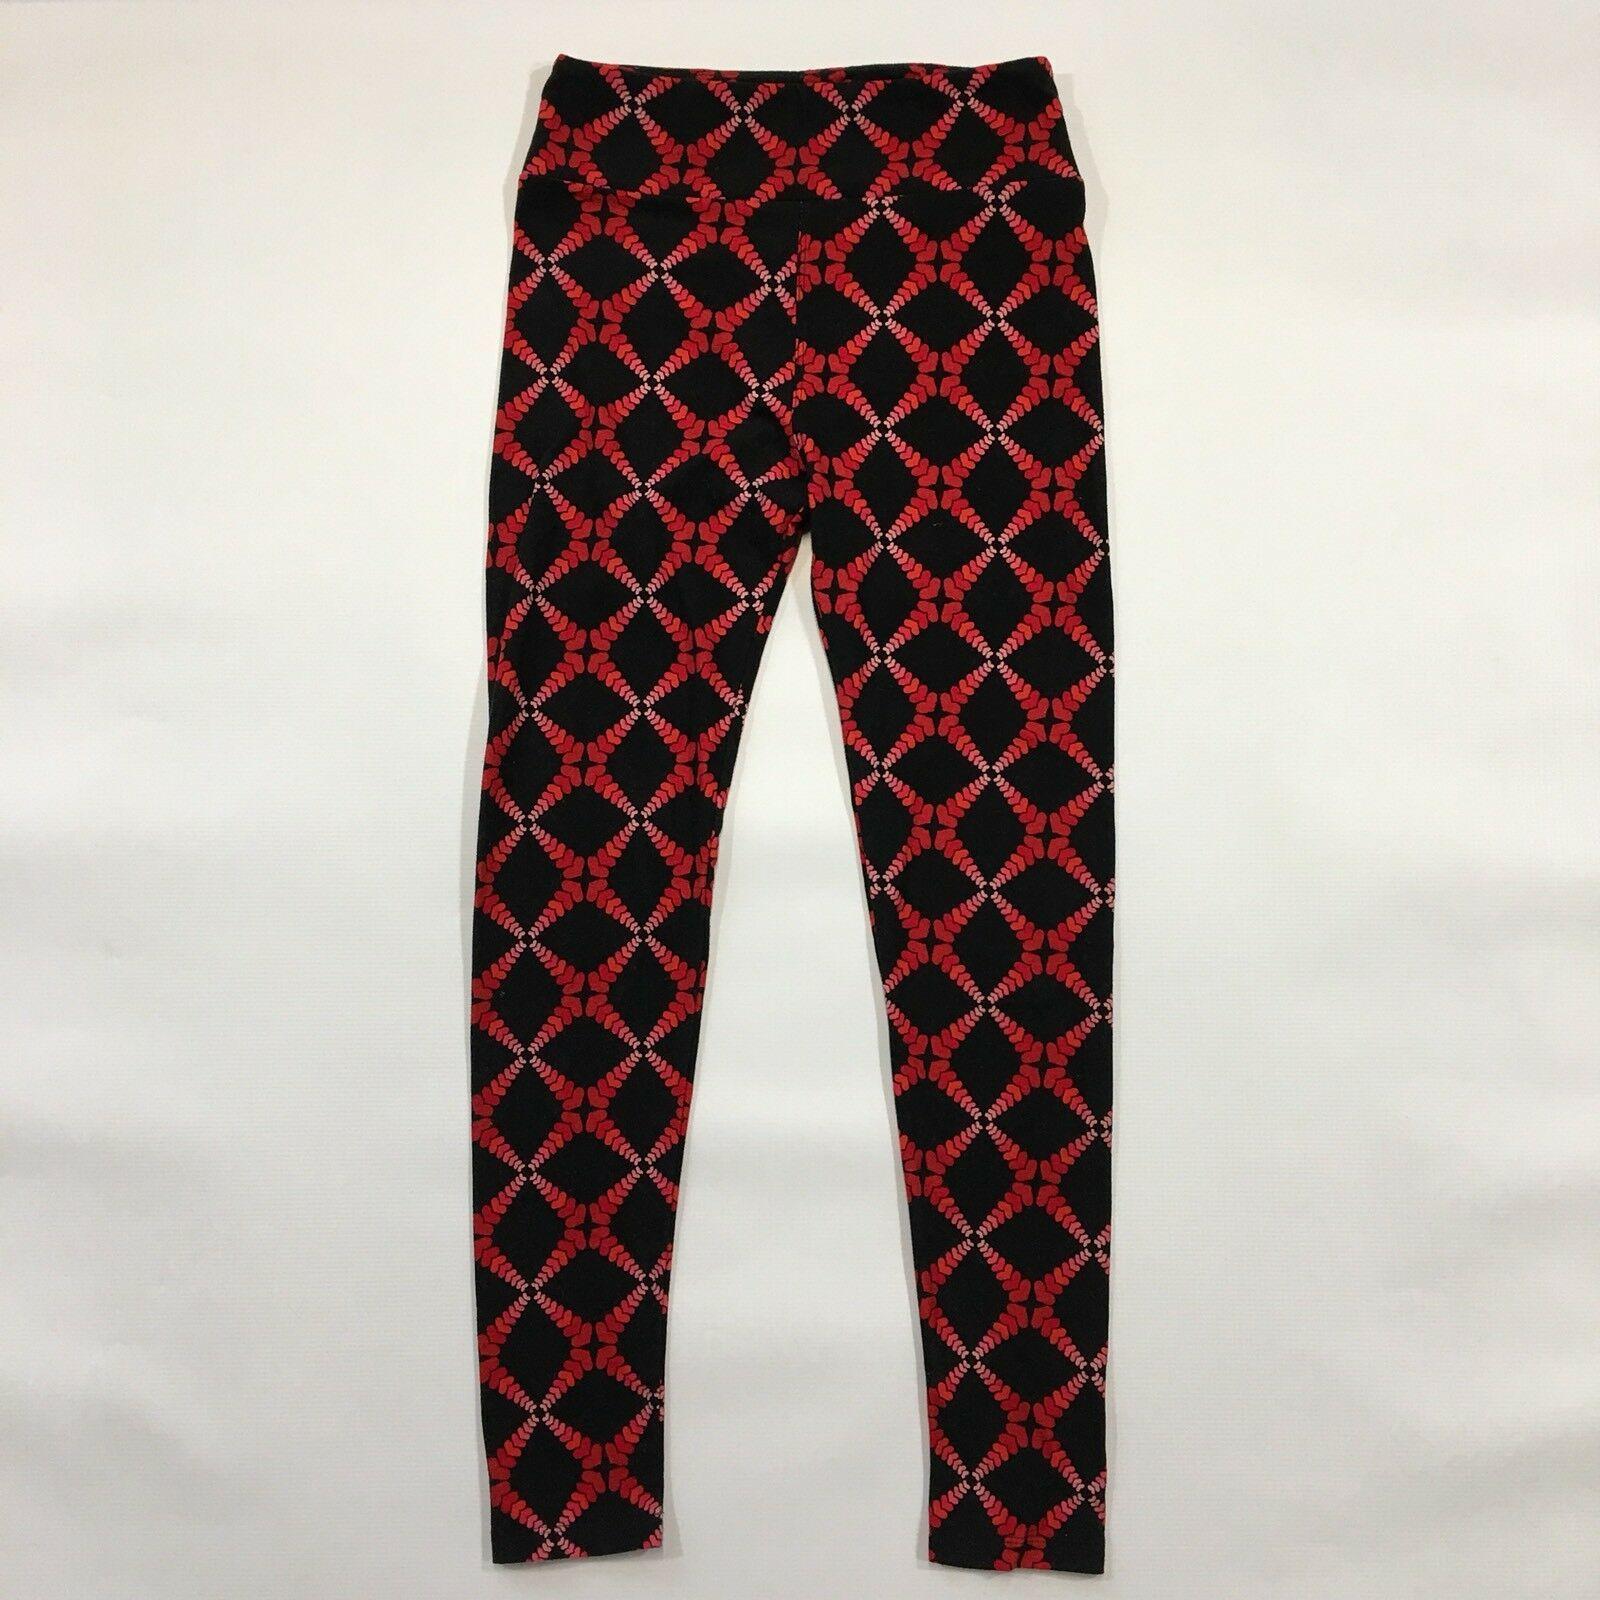 LuLaRoe OS Leggings Black Red Pink Gradient Hearts One Size Crisscross